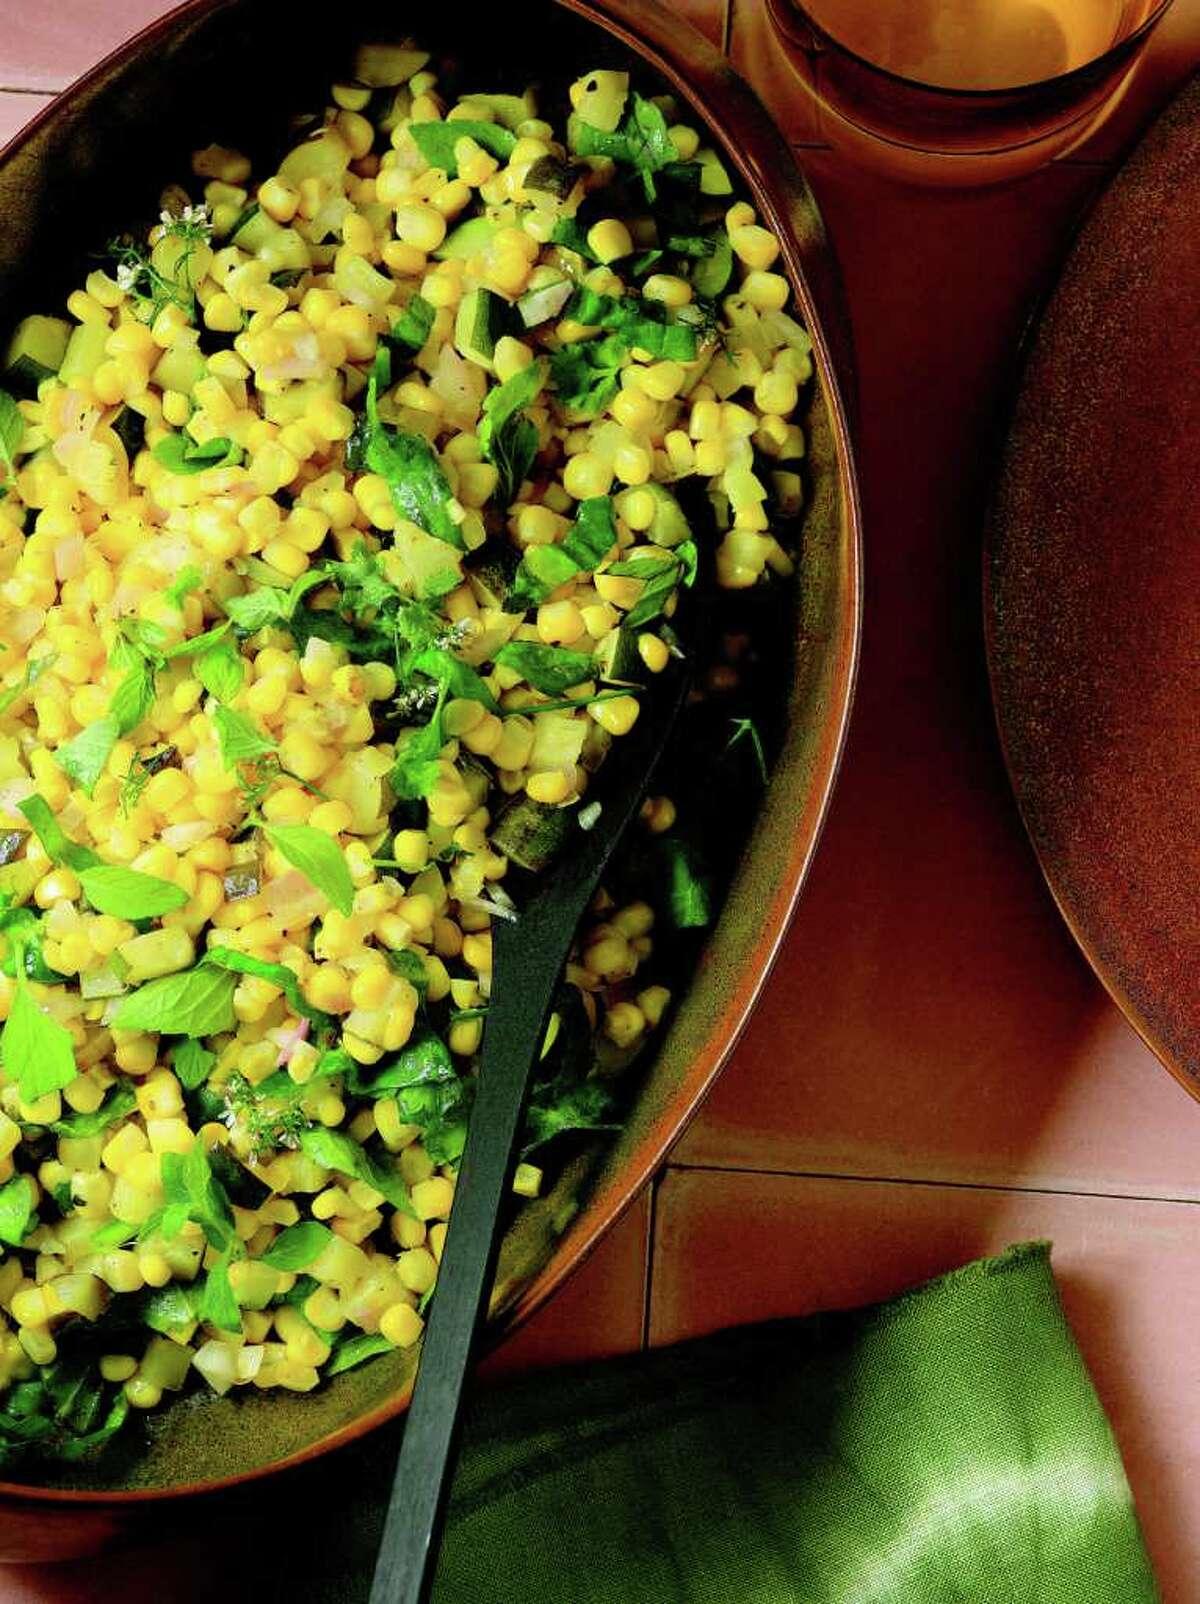 The recipe for Corn and Zucchini Salad is included in Eva Longoria's new cookbook,